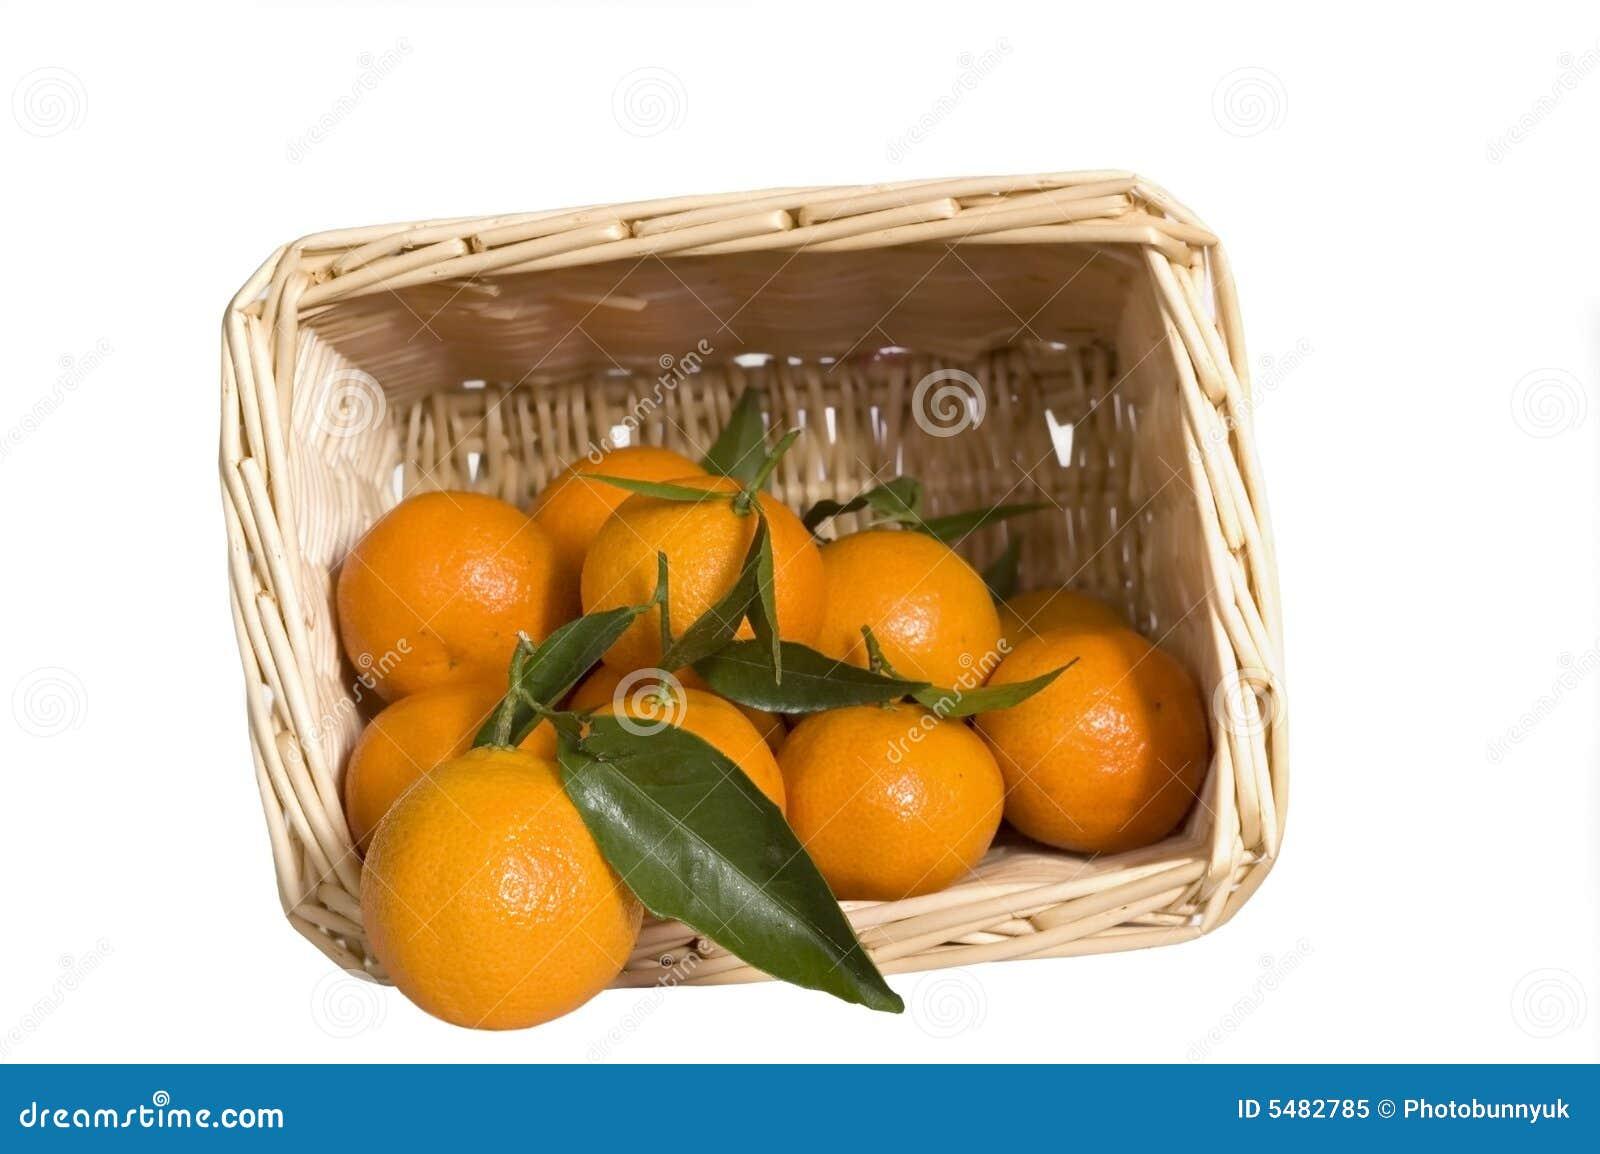 Satsumas in a wicker basket